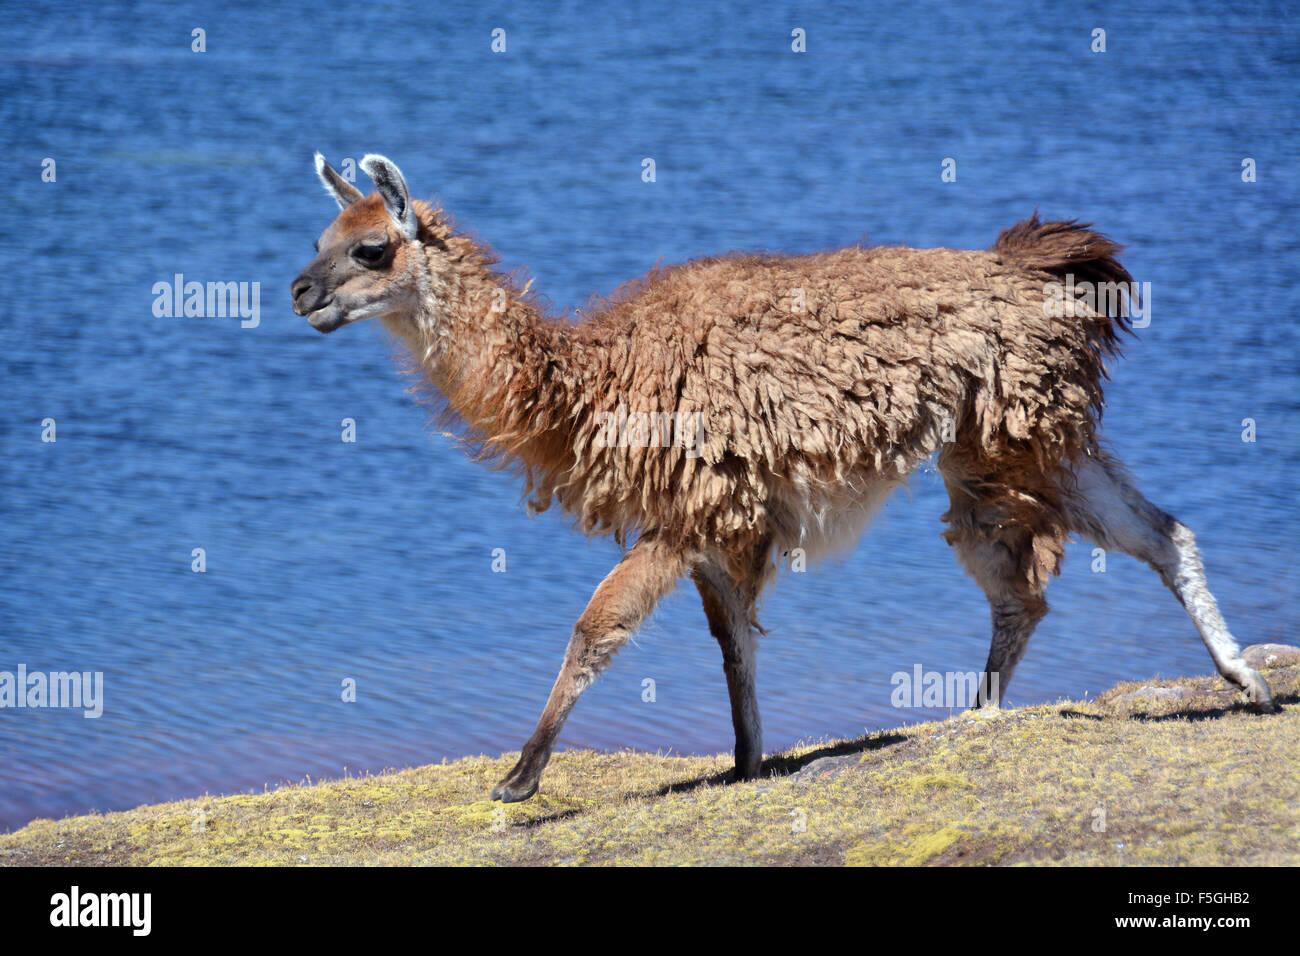 Brown llama (Lama glama) walking in front of lake, Altiplano, Bolivia - Stock Image